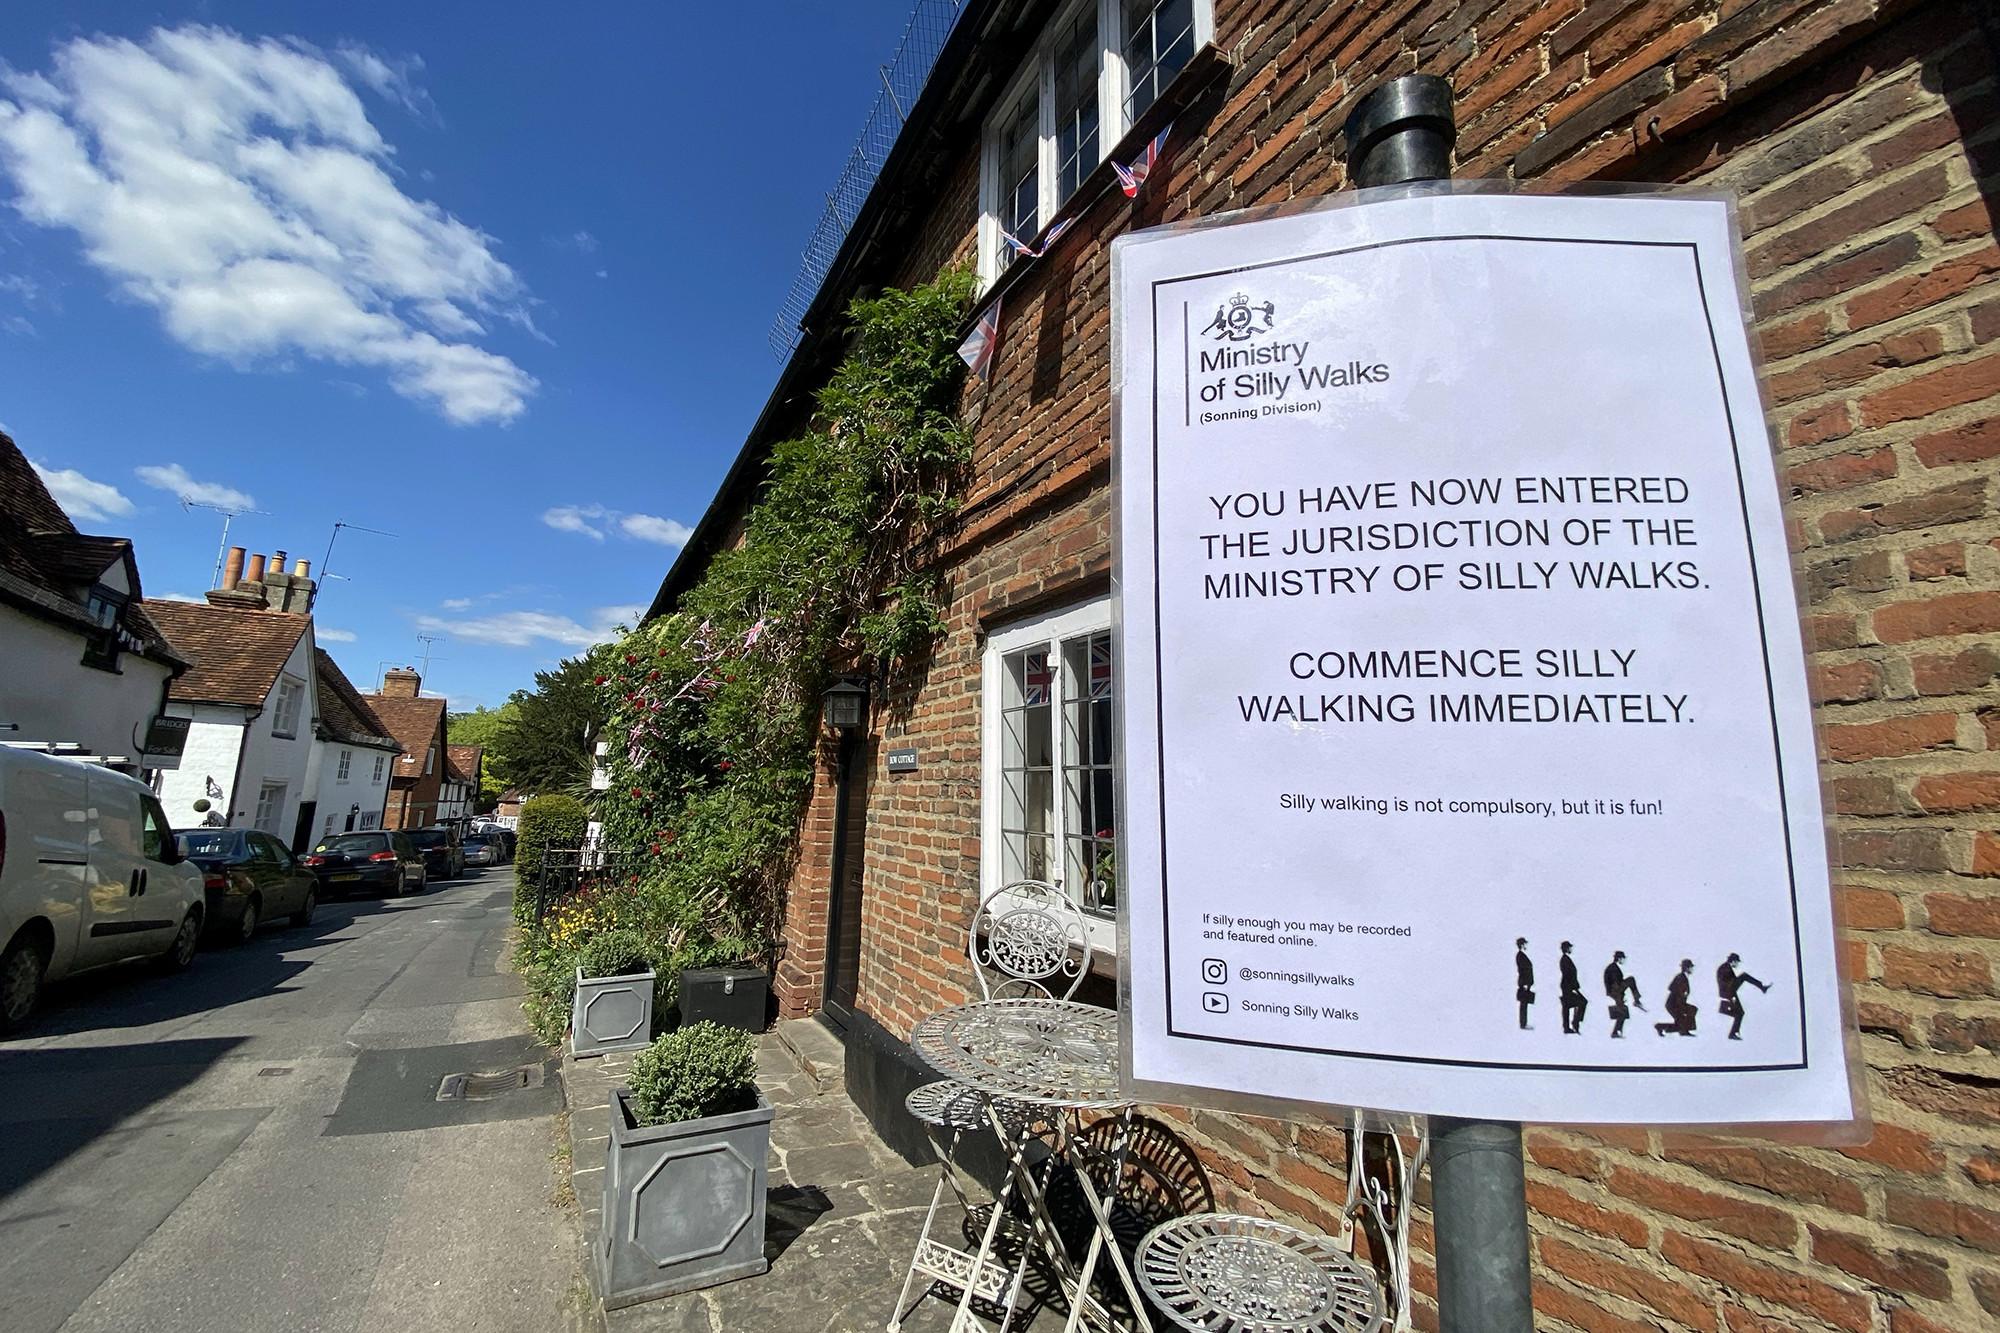 Monty Python Silly Walk yard sign